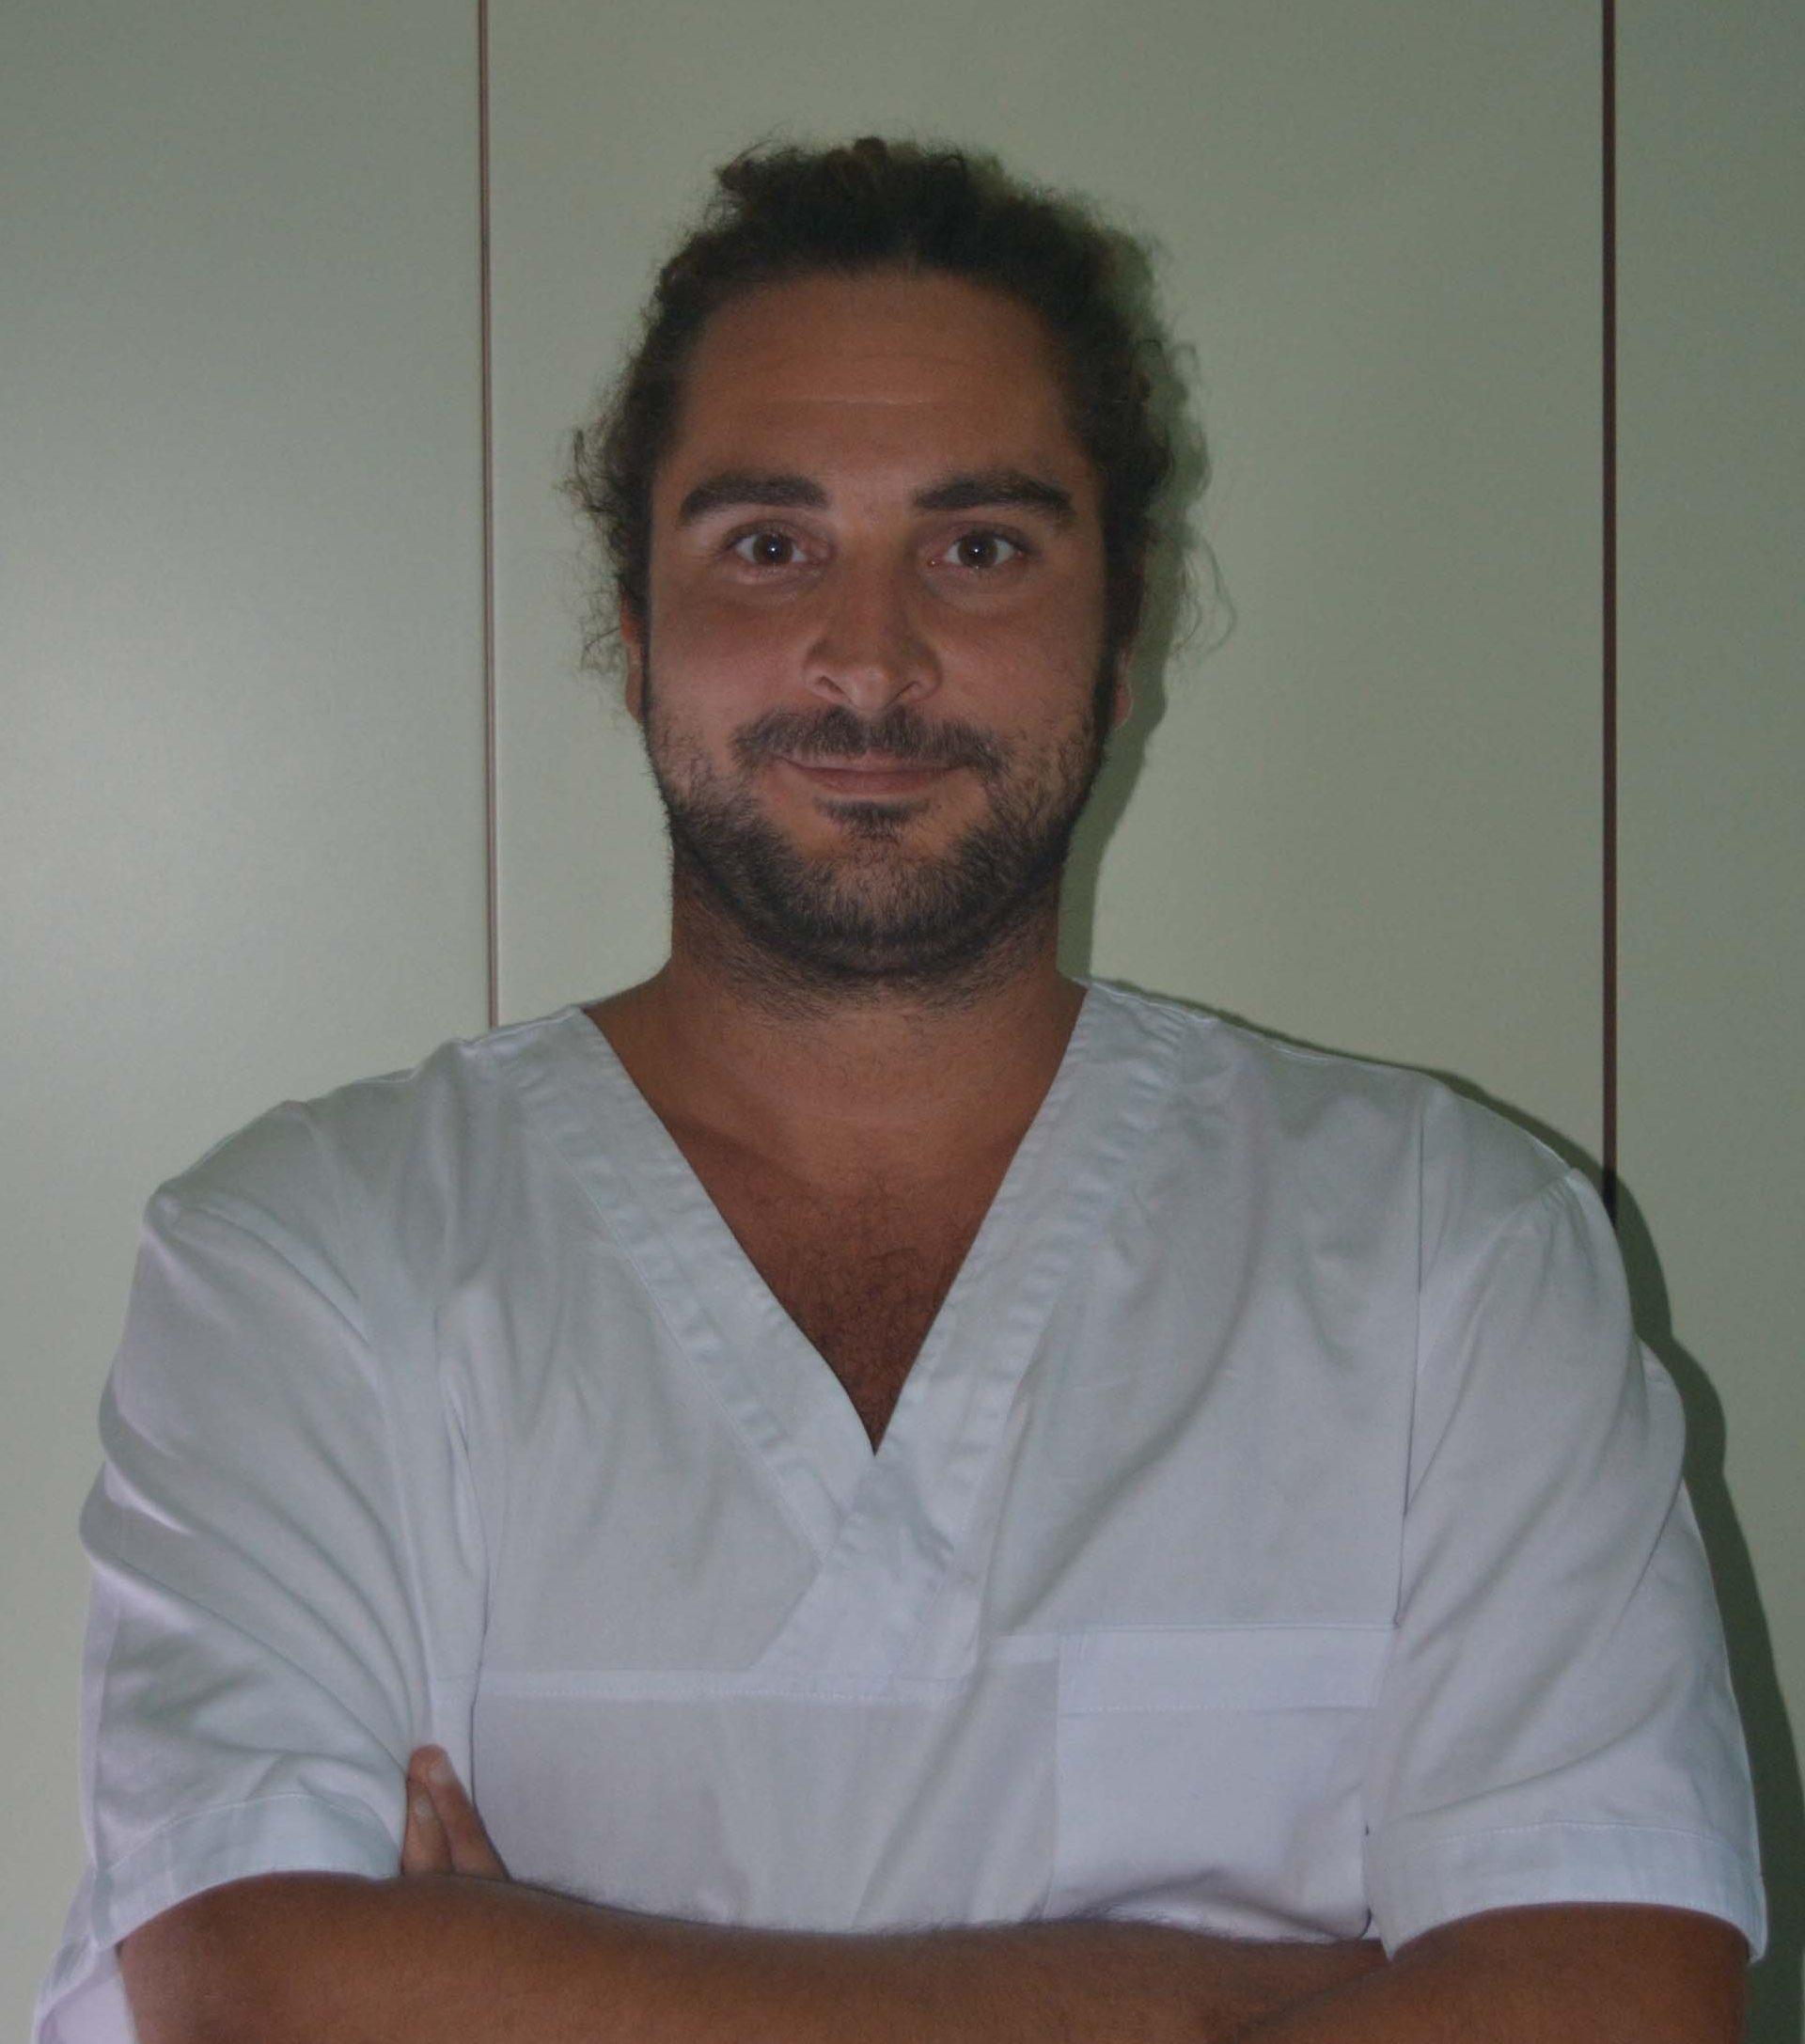 Matteo Boniforti